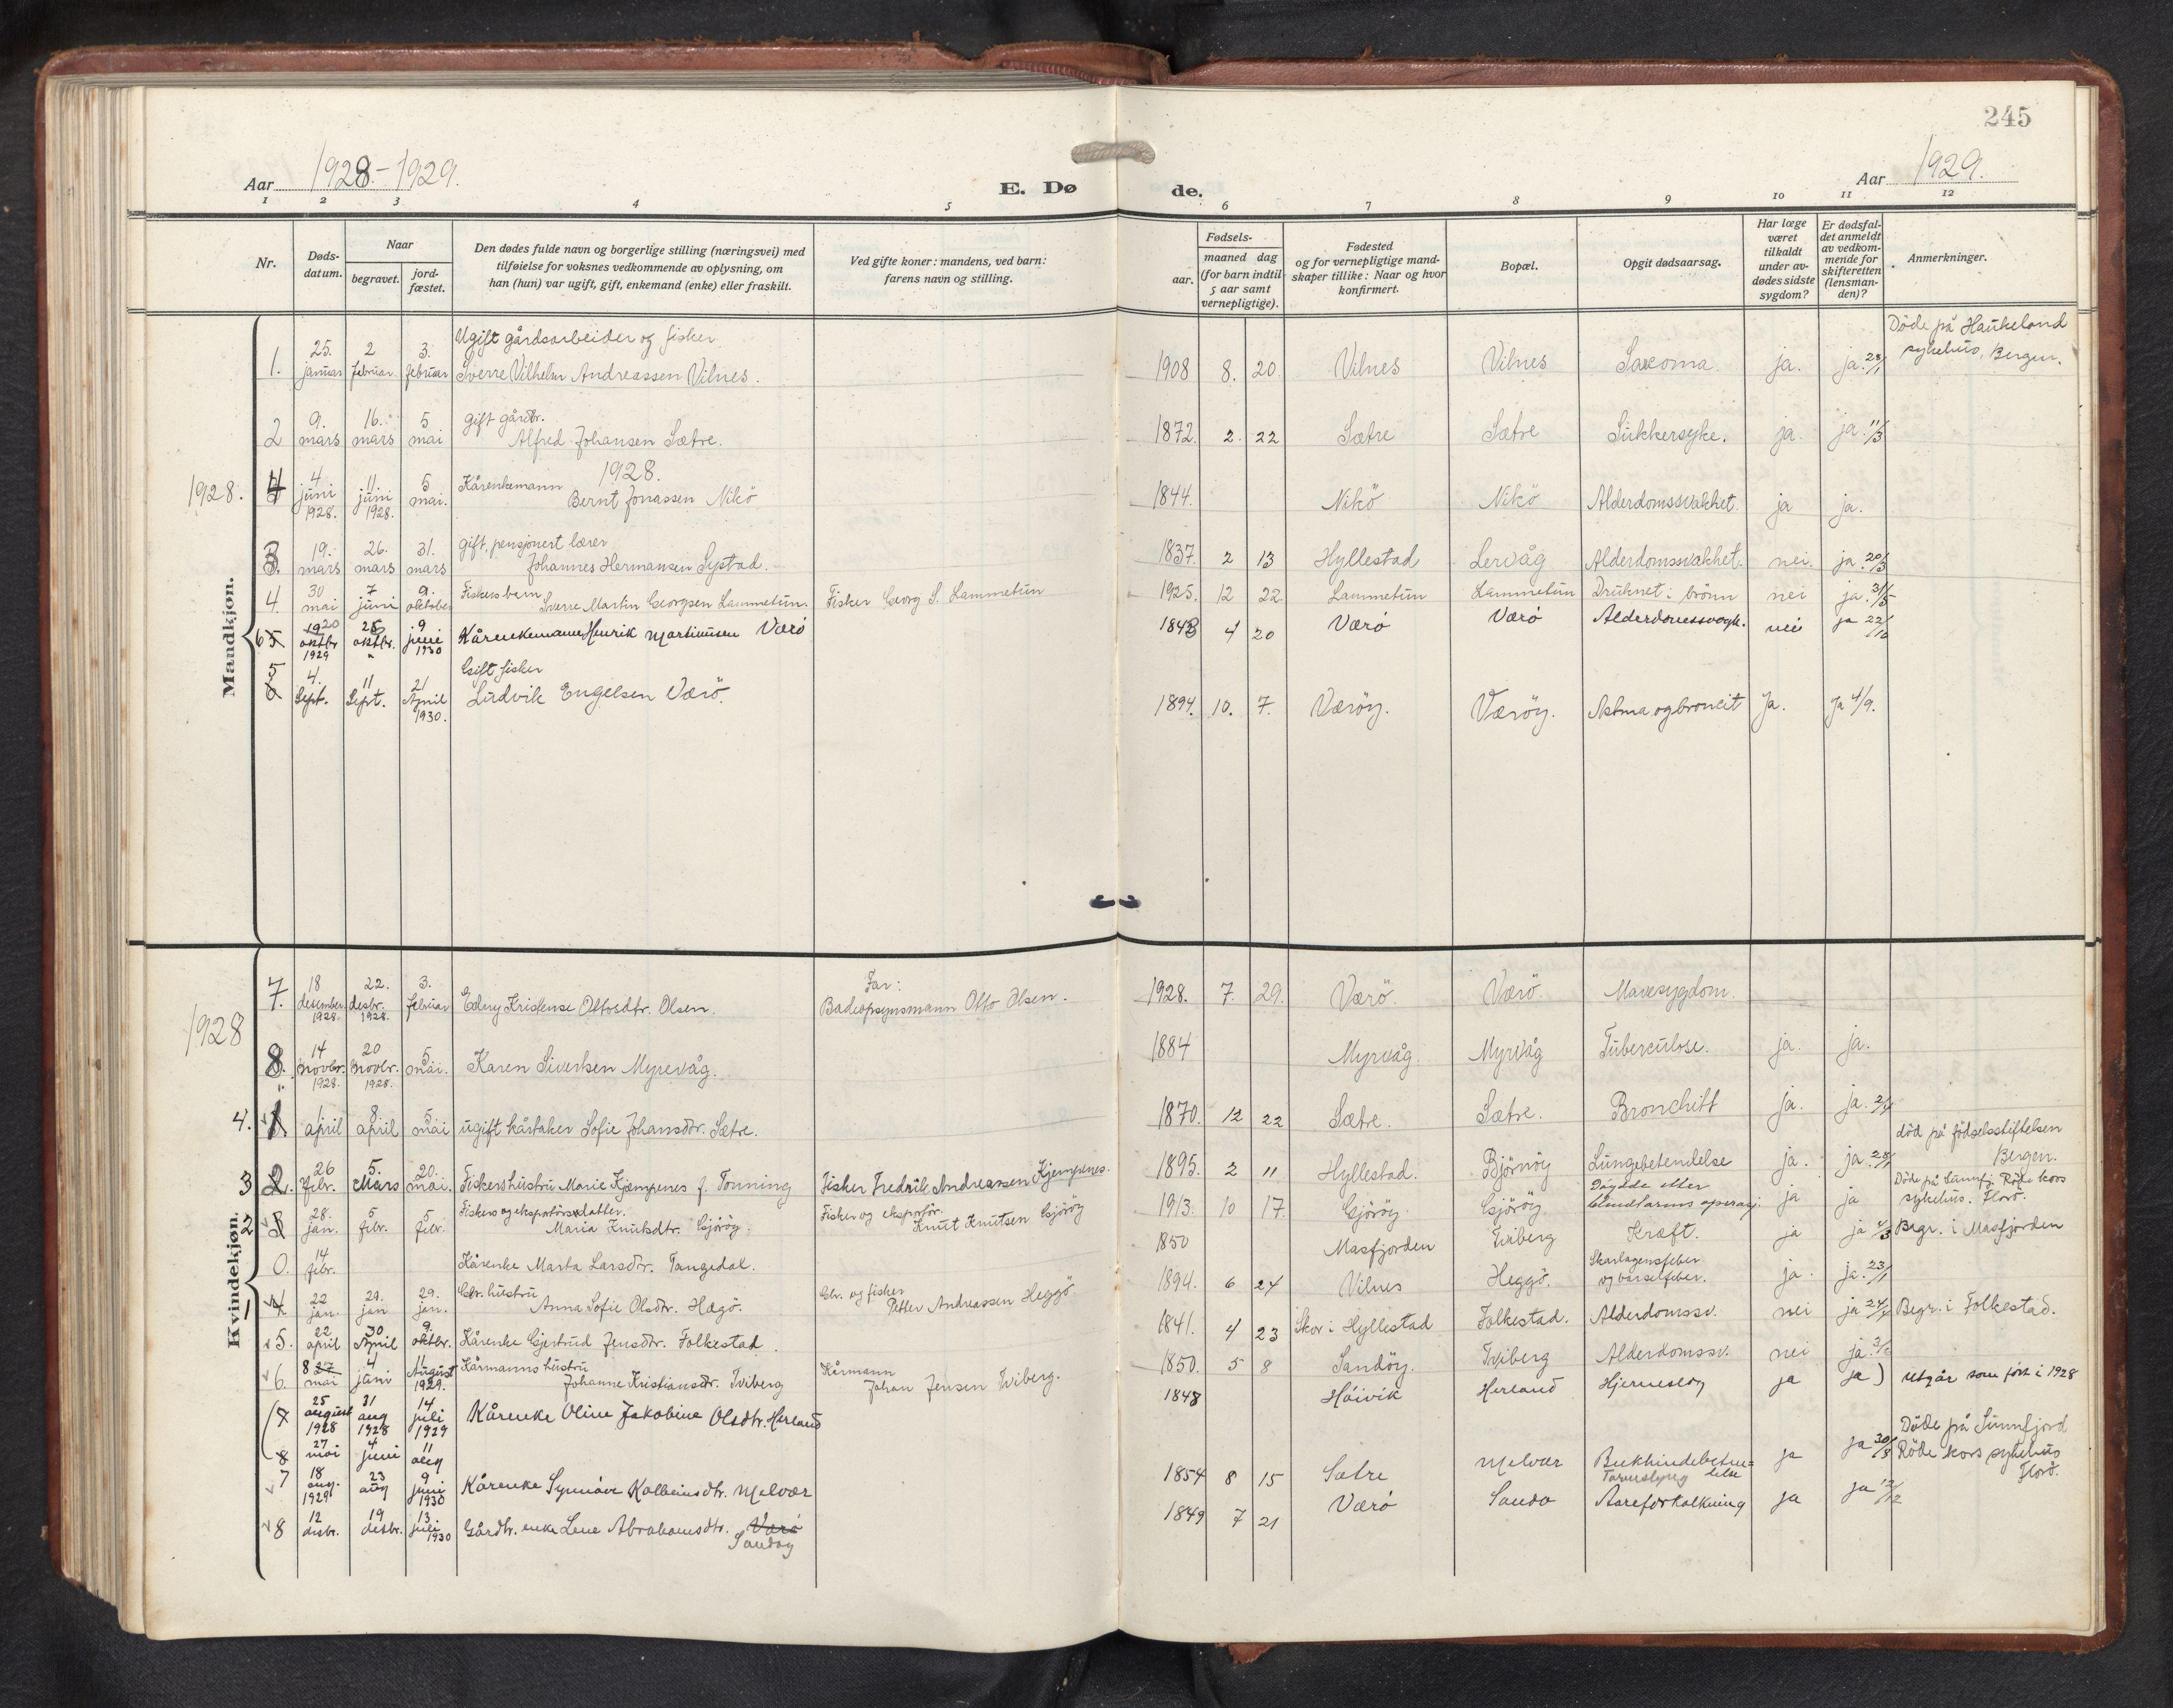 SAB, Askvoll sokneprestembete, H/Hab/Habb/L0002: Klokkerbok nr. B 2, 1910-1947, s. 244b-245a